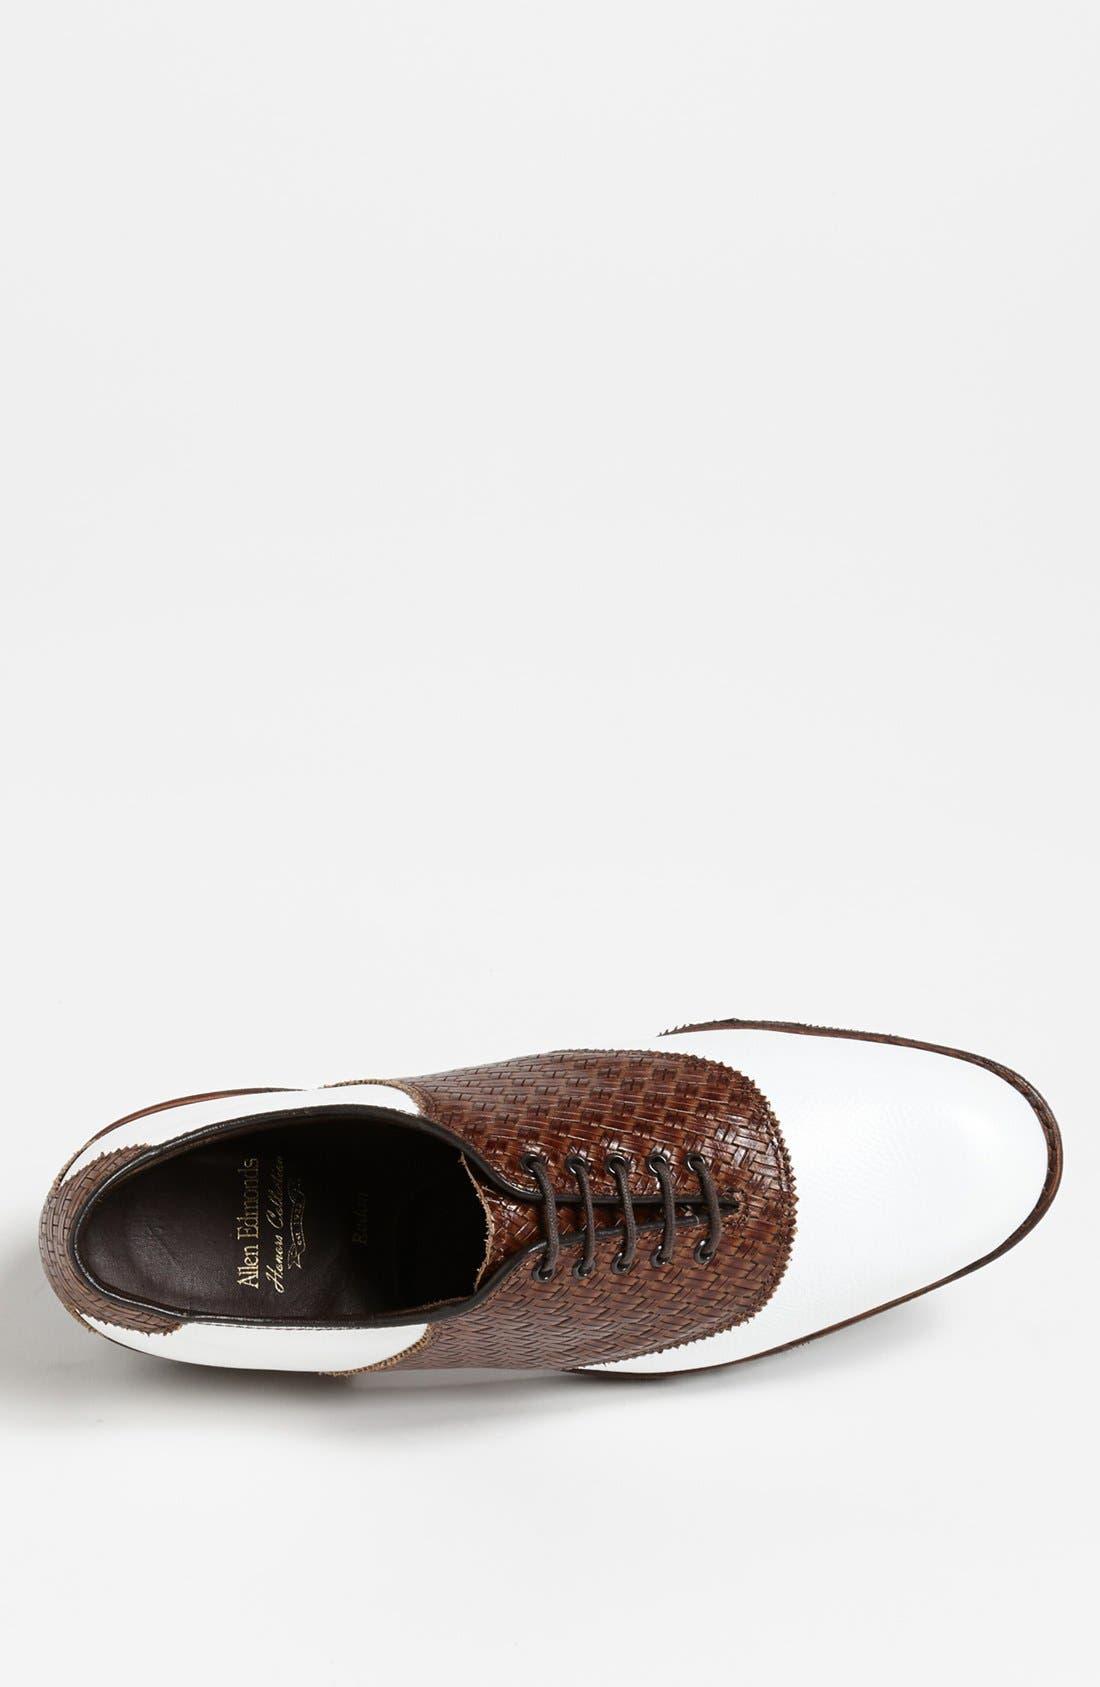 Alternate Image 3  - Allen Edmonds 'Redan' Golf Shoe (Men)